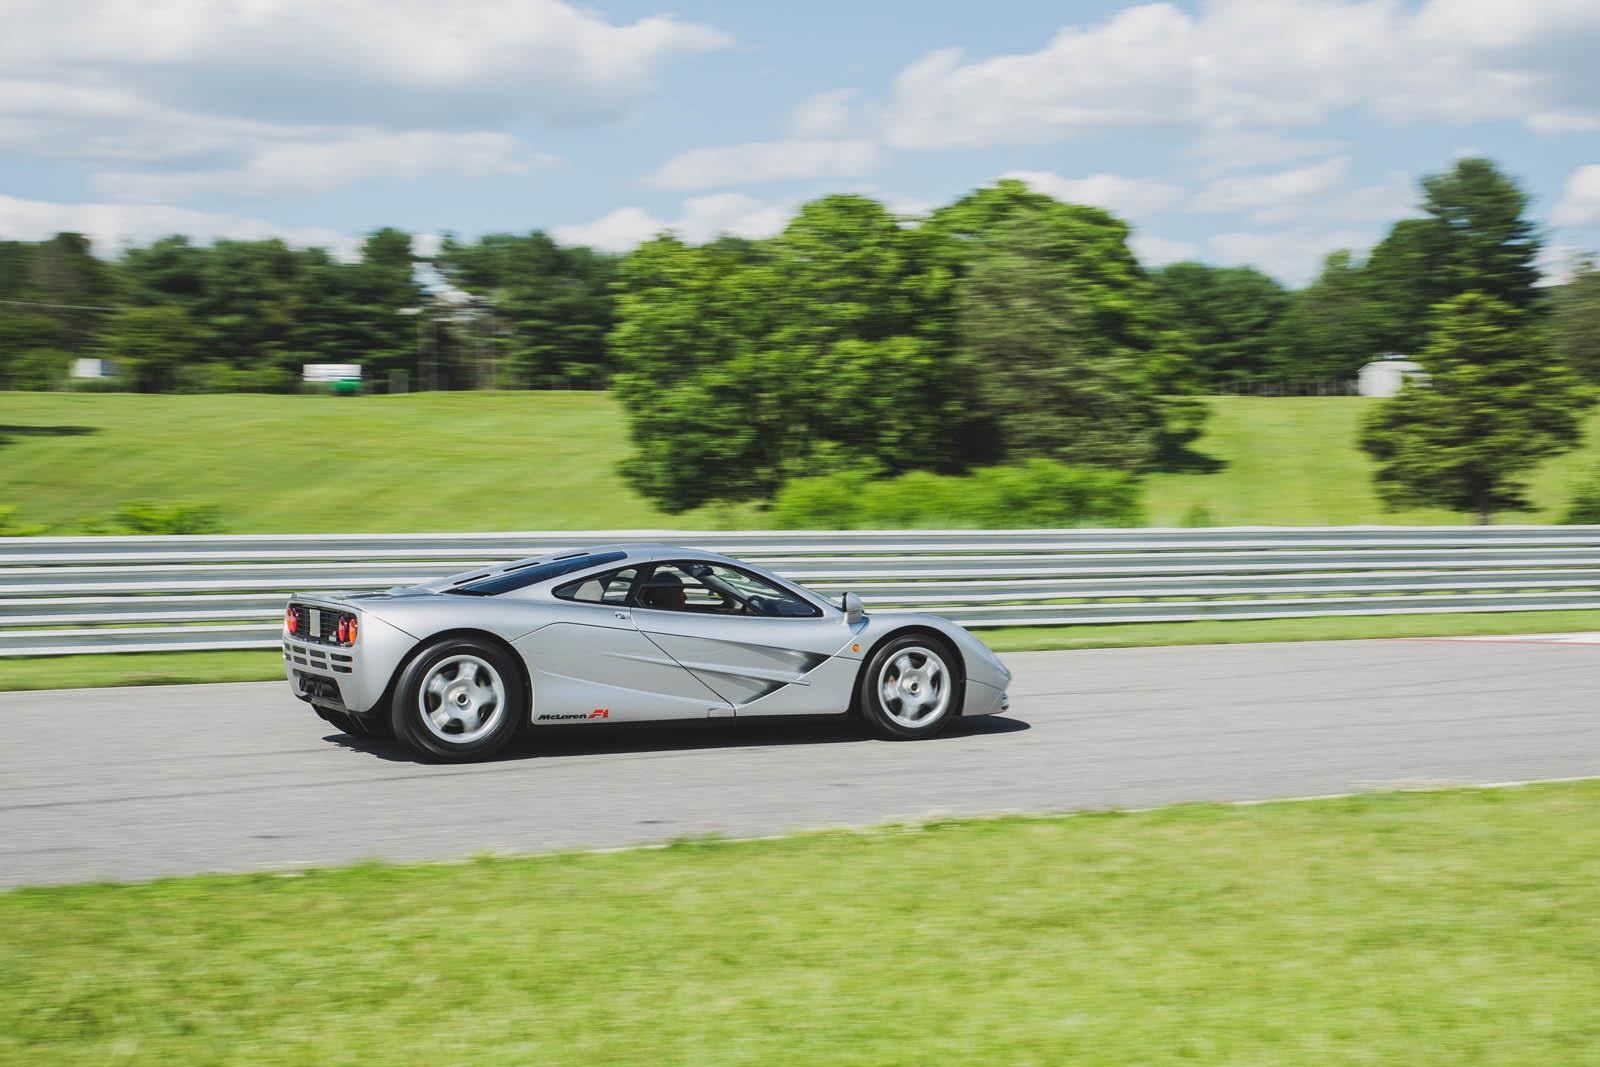 McLaren_F1-39 copy